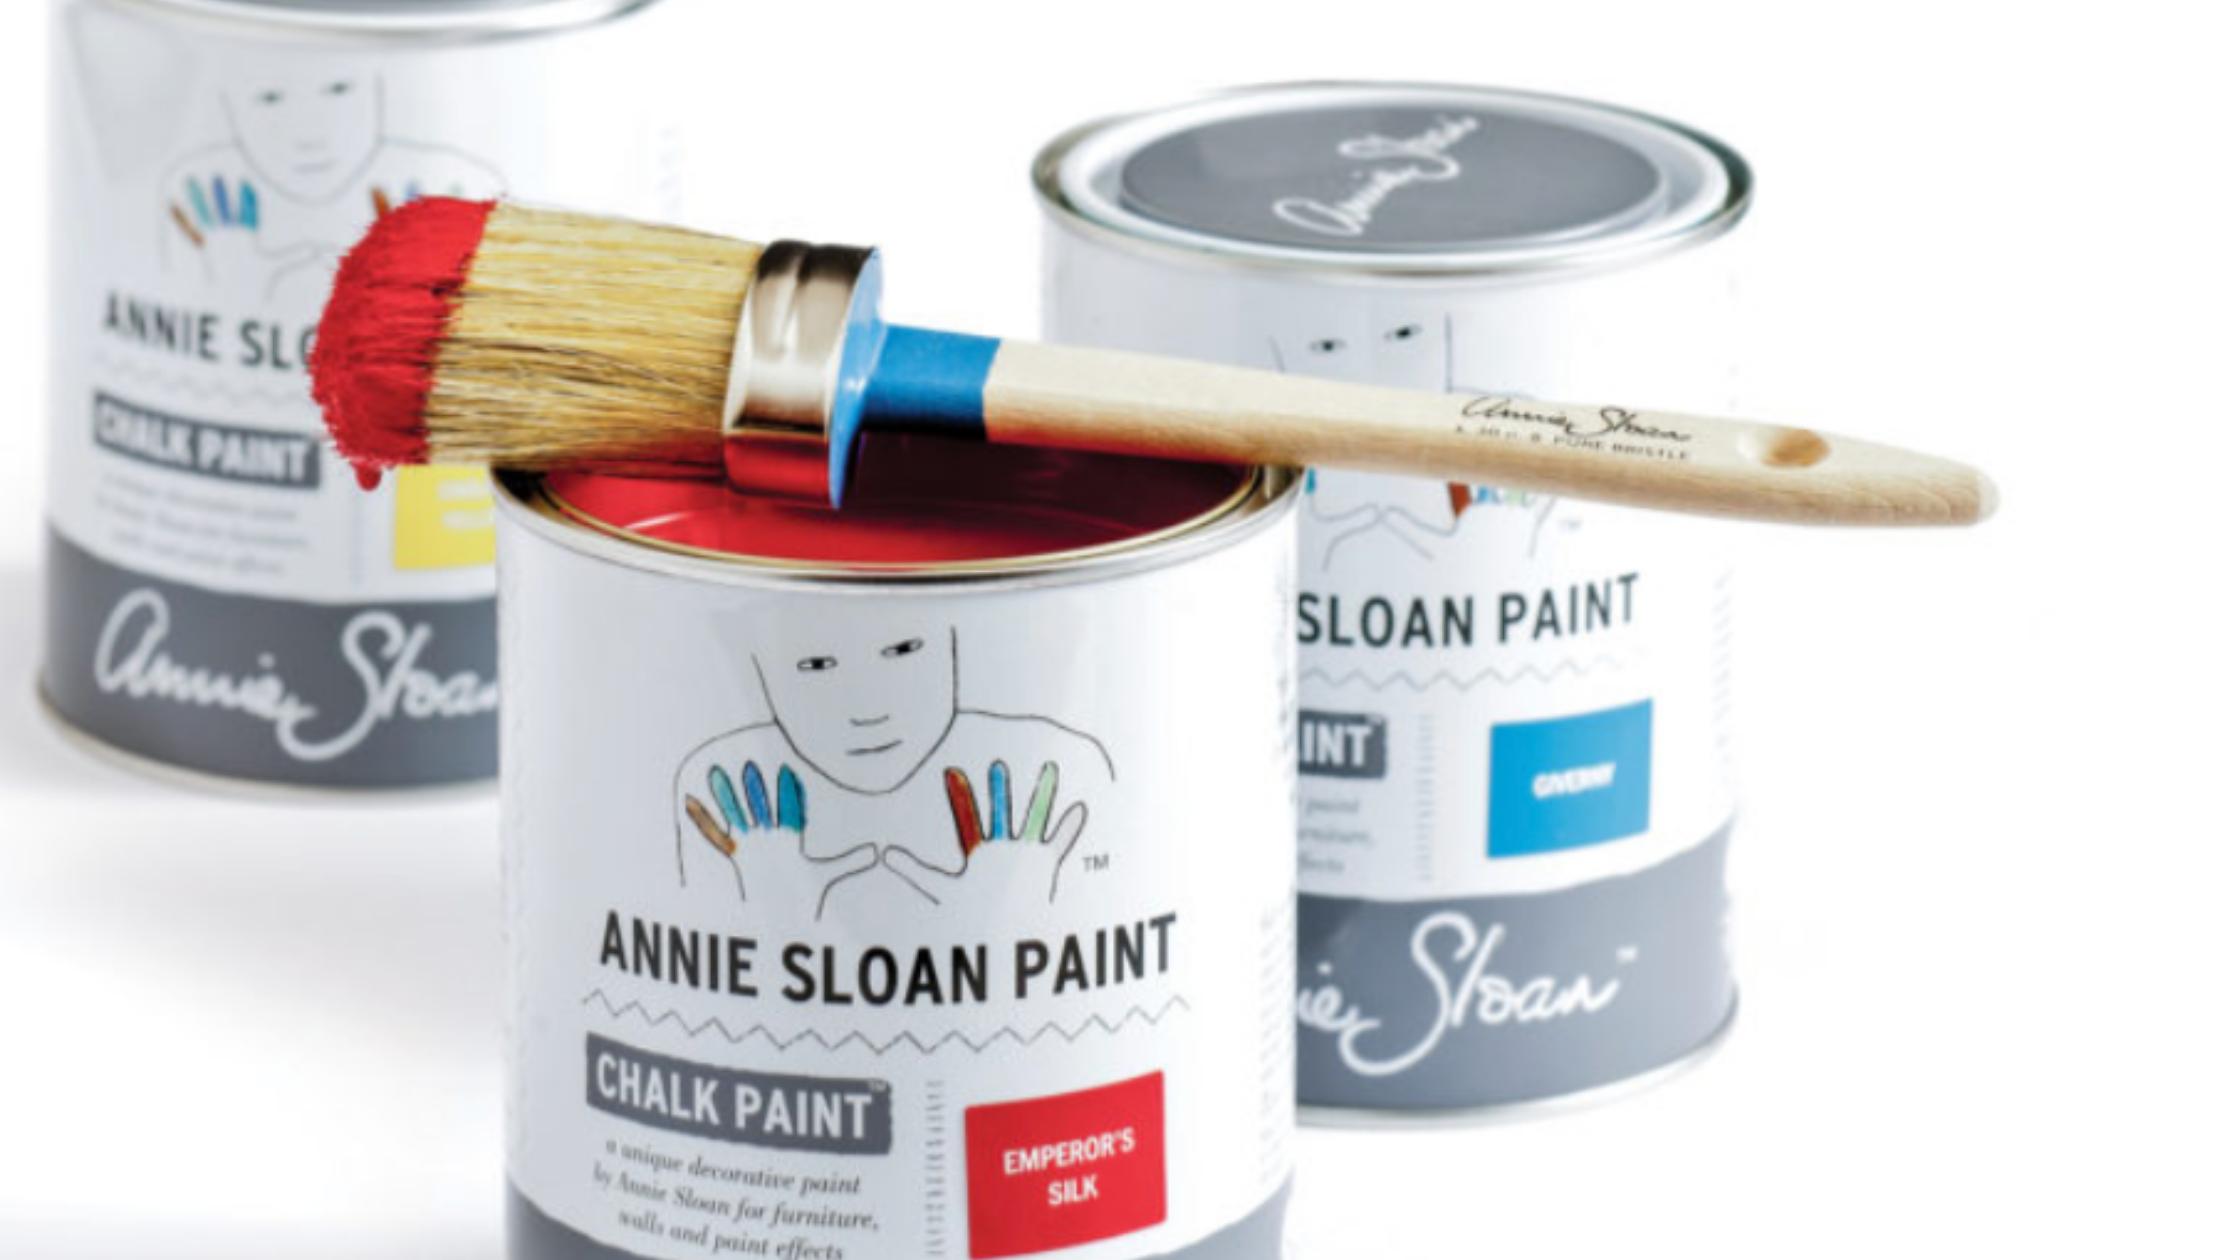 Annie Sloan chalk paint can of paint